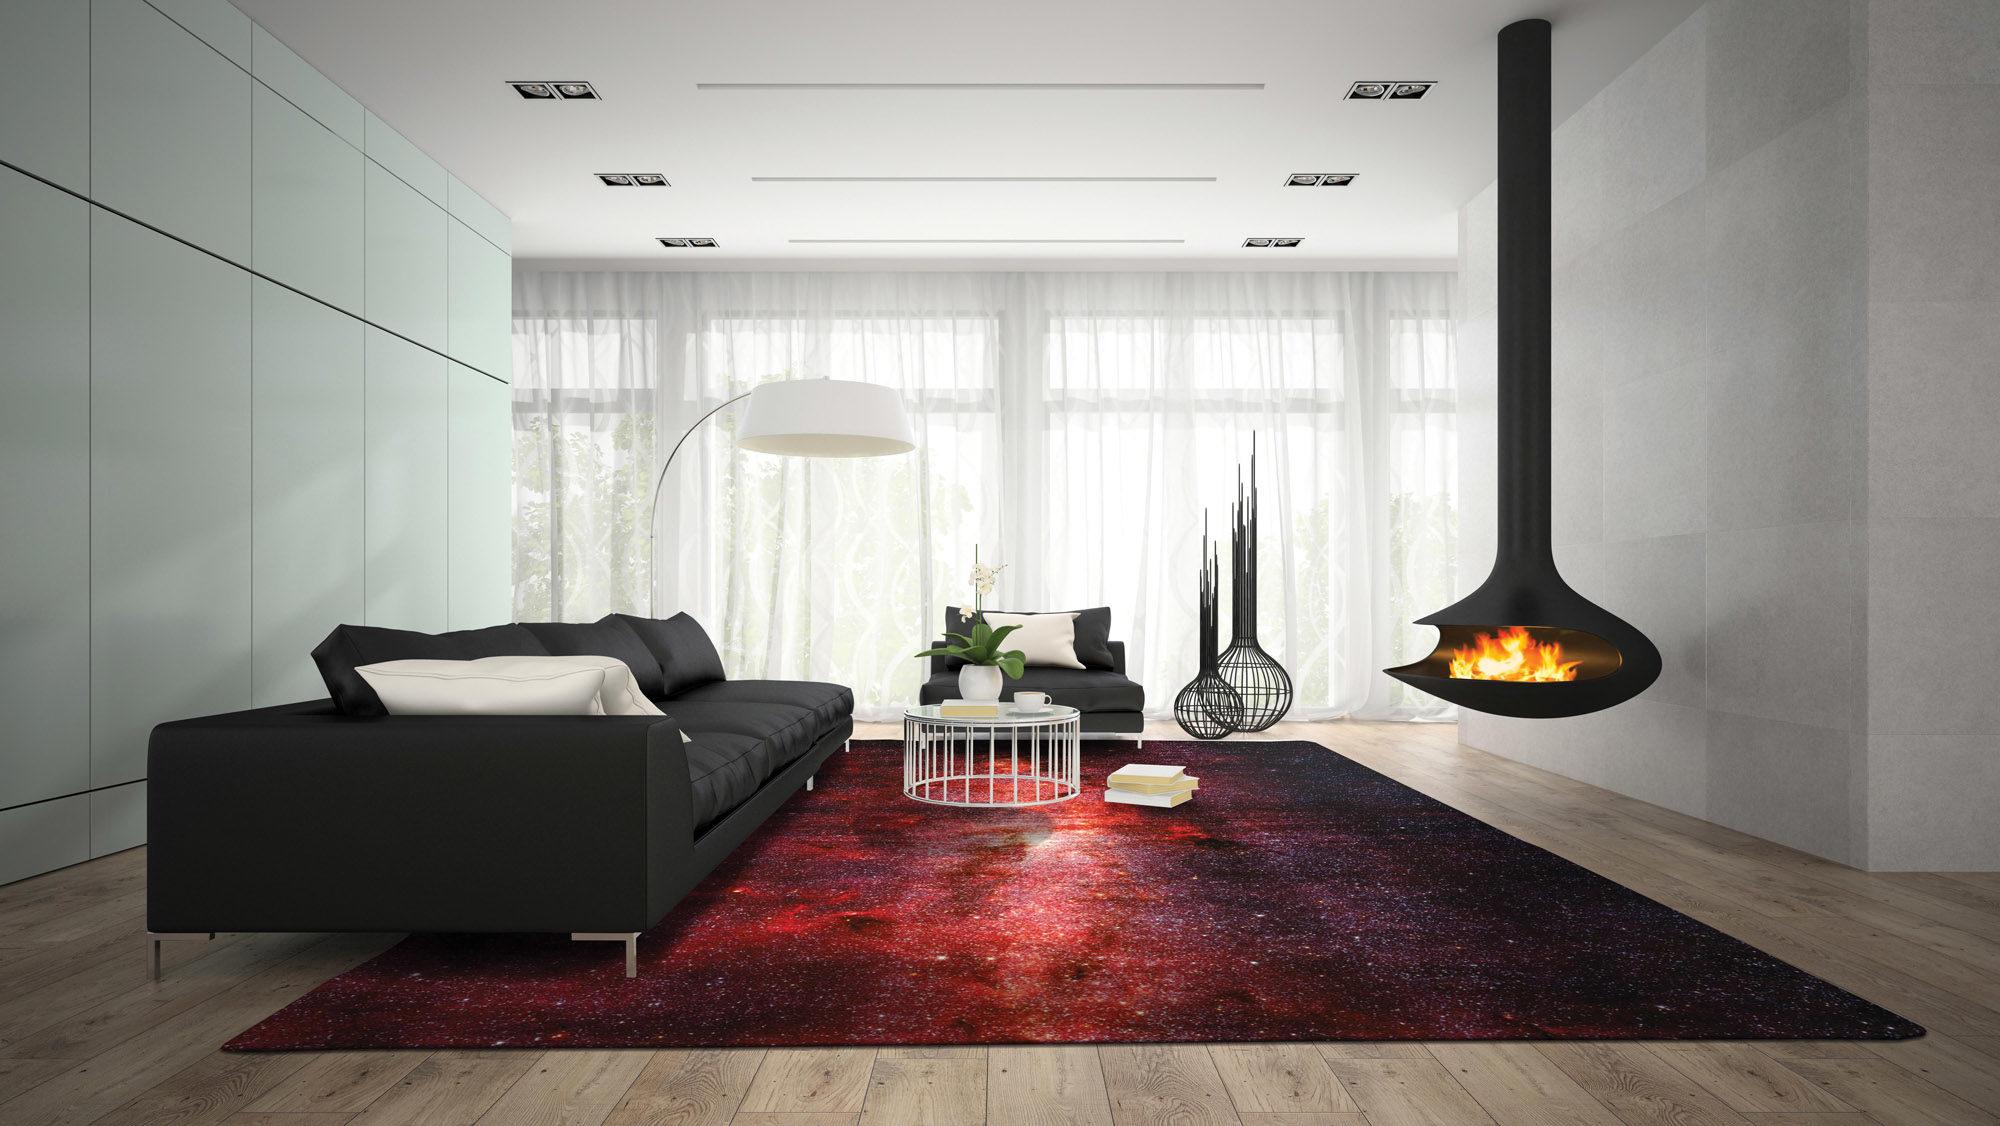 Interno di una stanza moderna con render 3d fireplace tappeto Artep